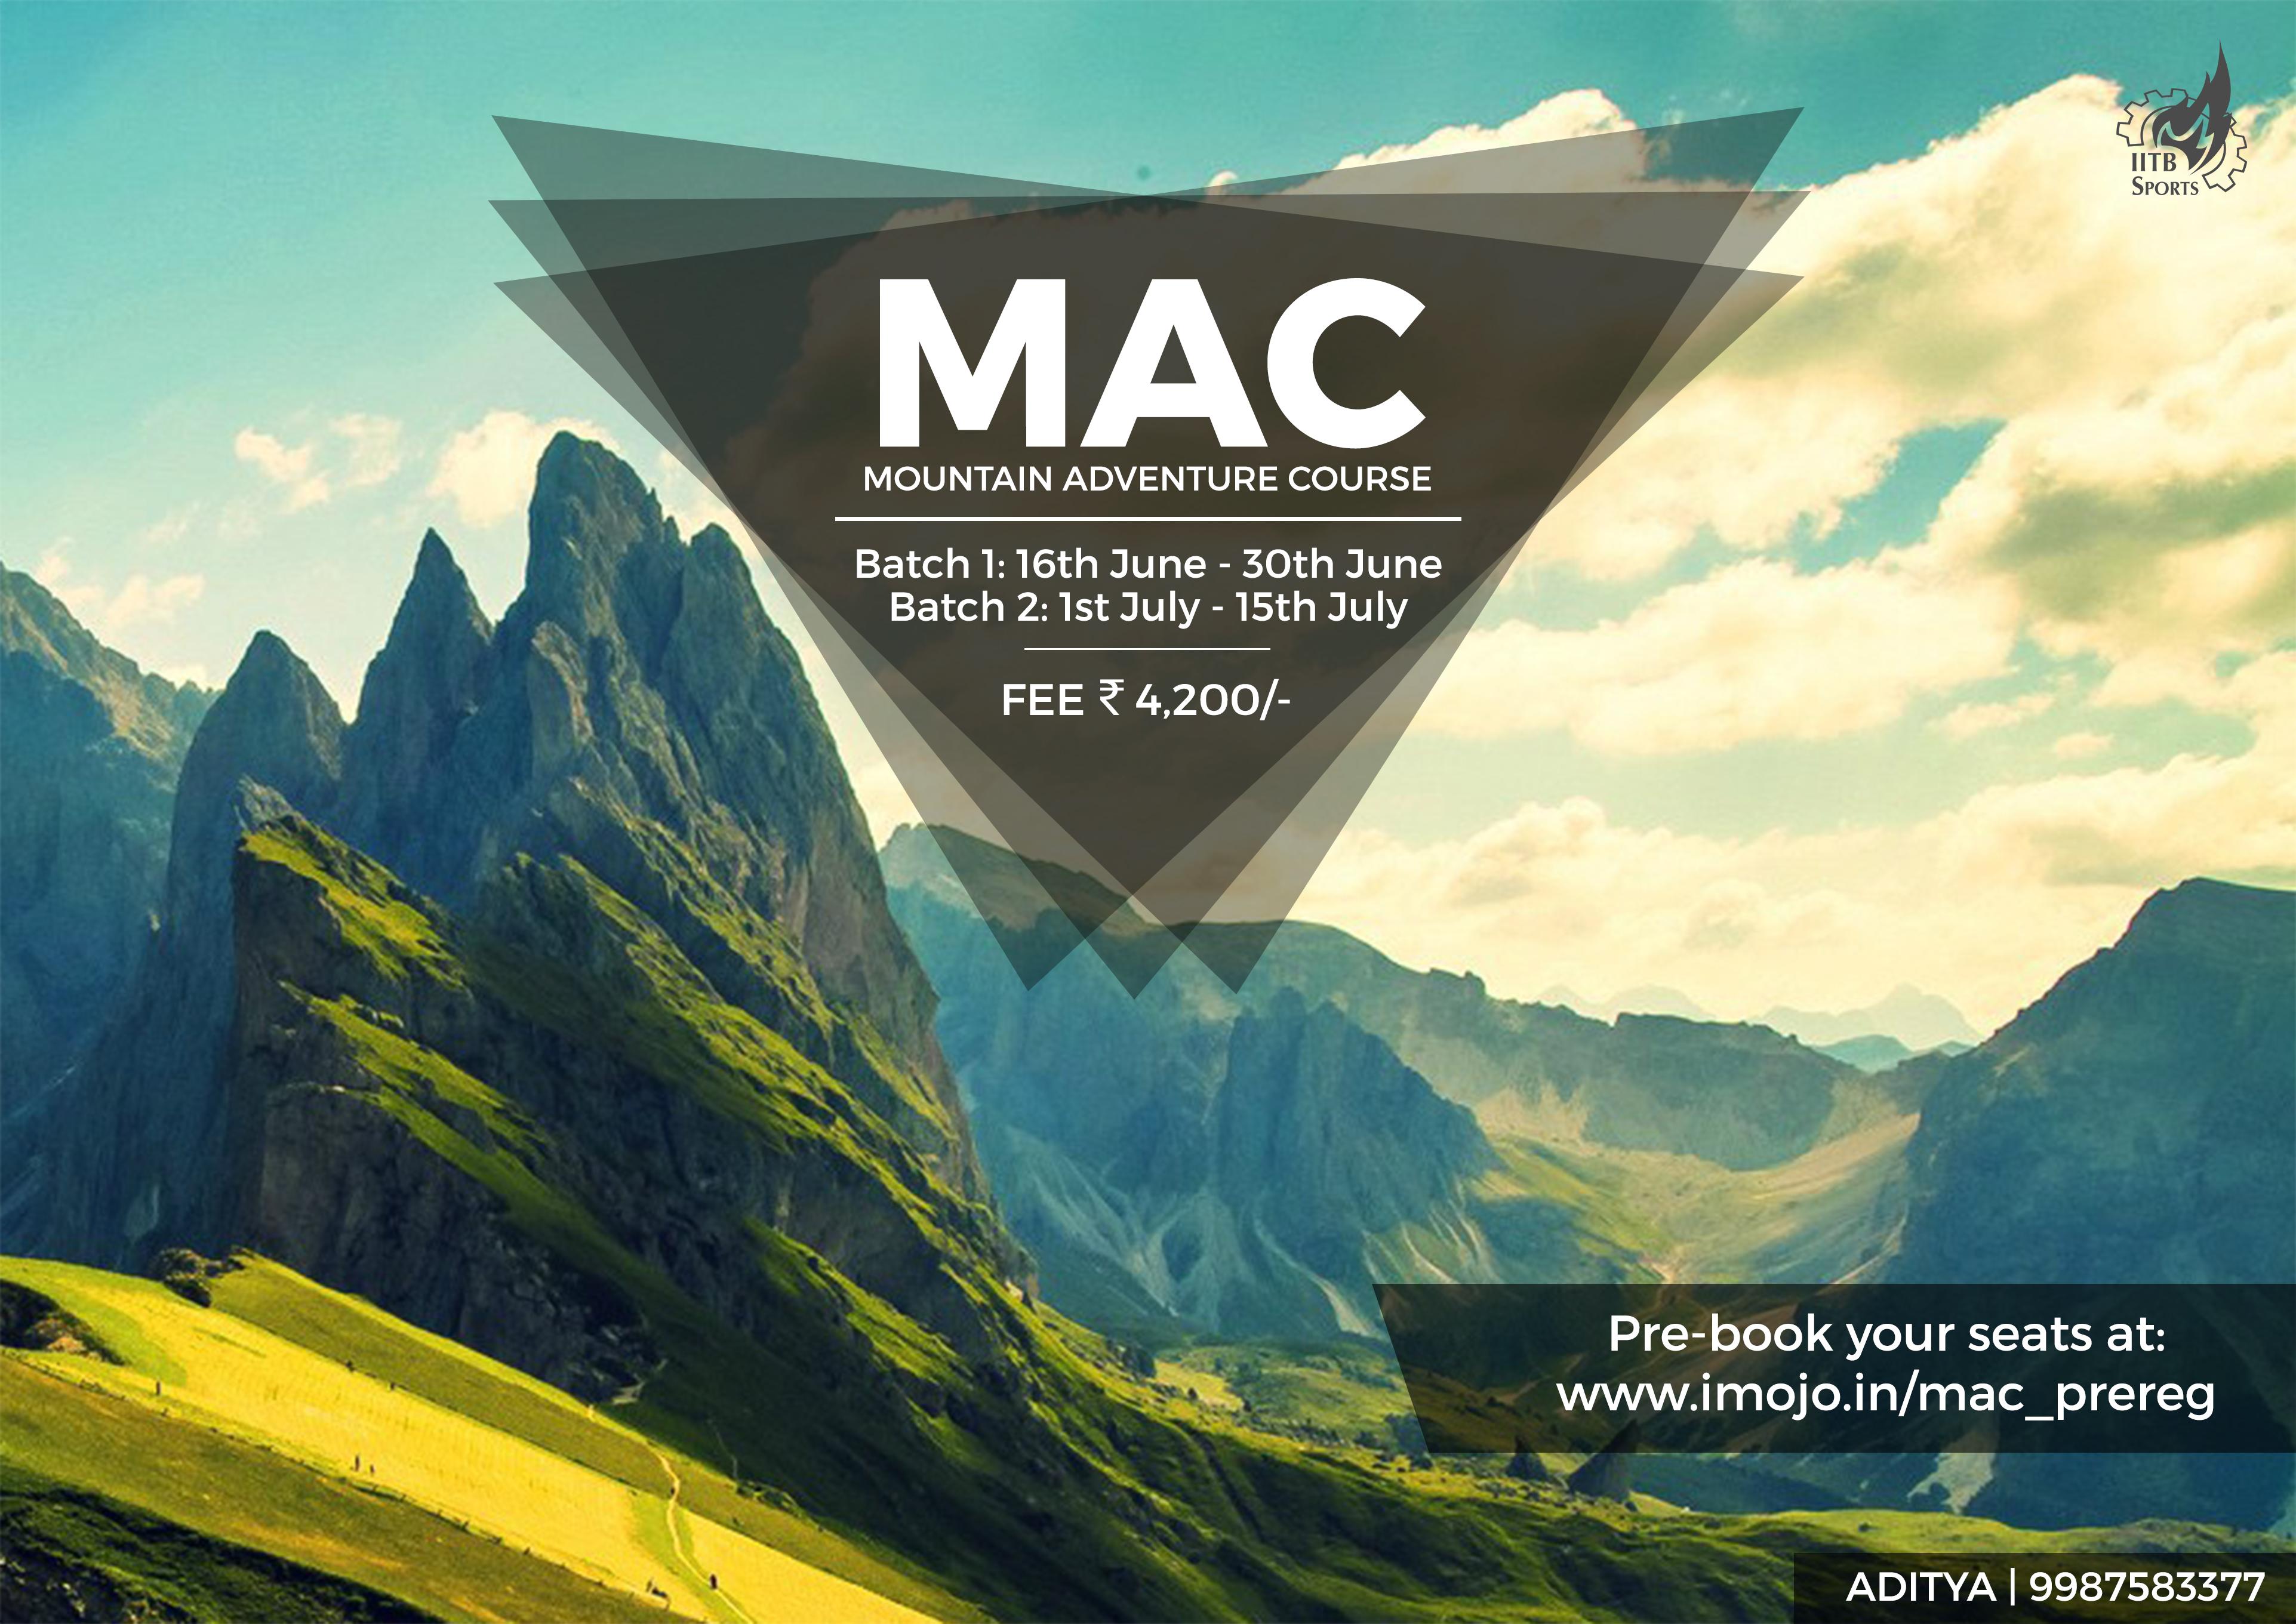 mountain adventure course mac iit bombay sports